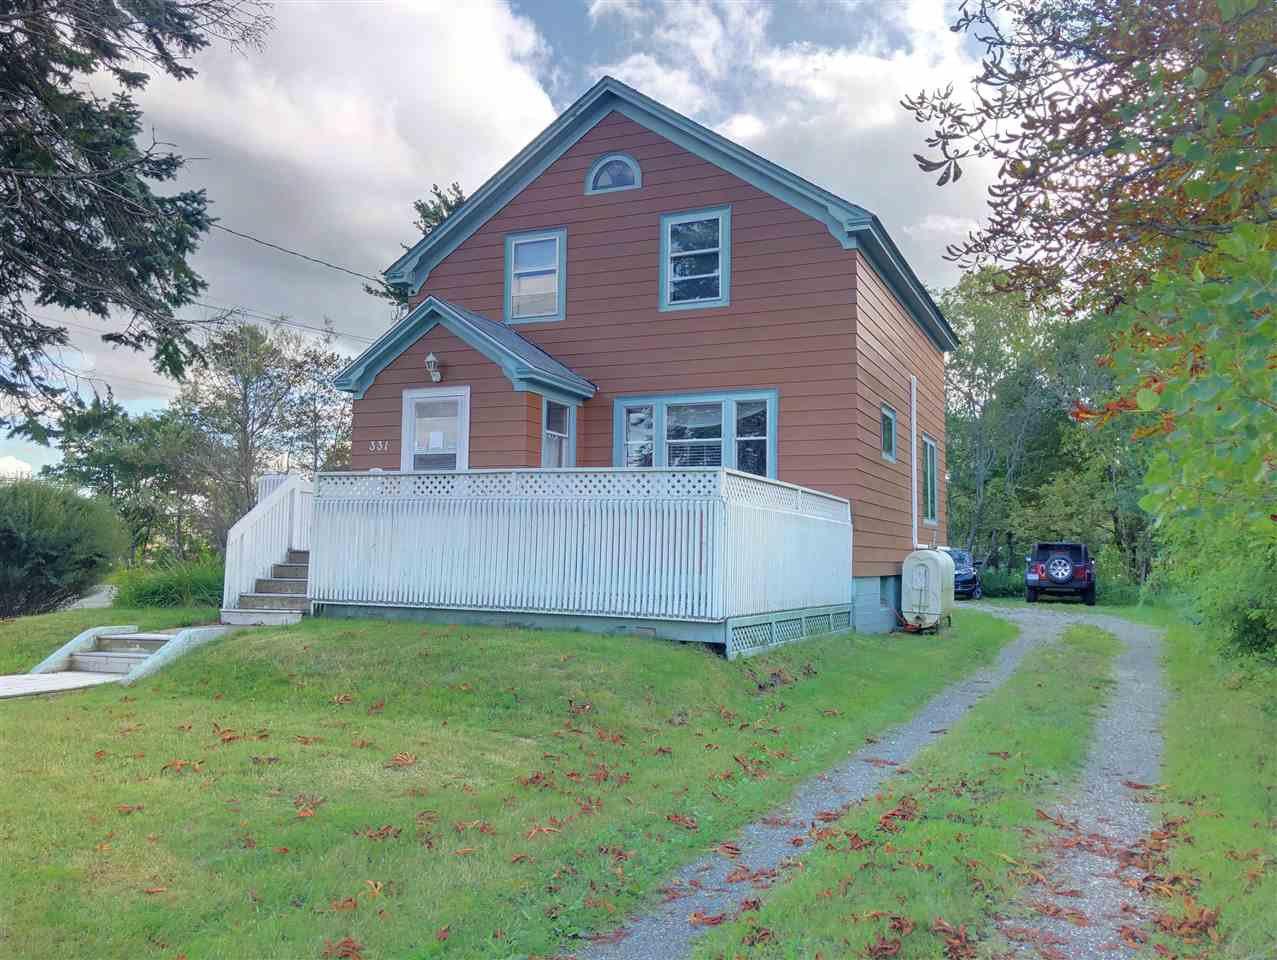 Main Photo: 331 Keltic Drive in Coxheath: 202-Sydney River / Coxheath Residential for sale (Cape Breton)  : MLS®# 202017590